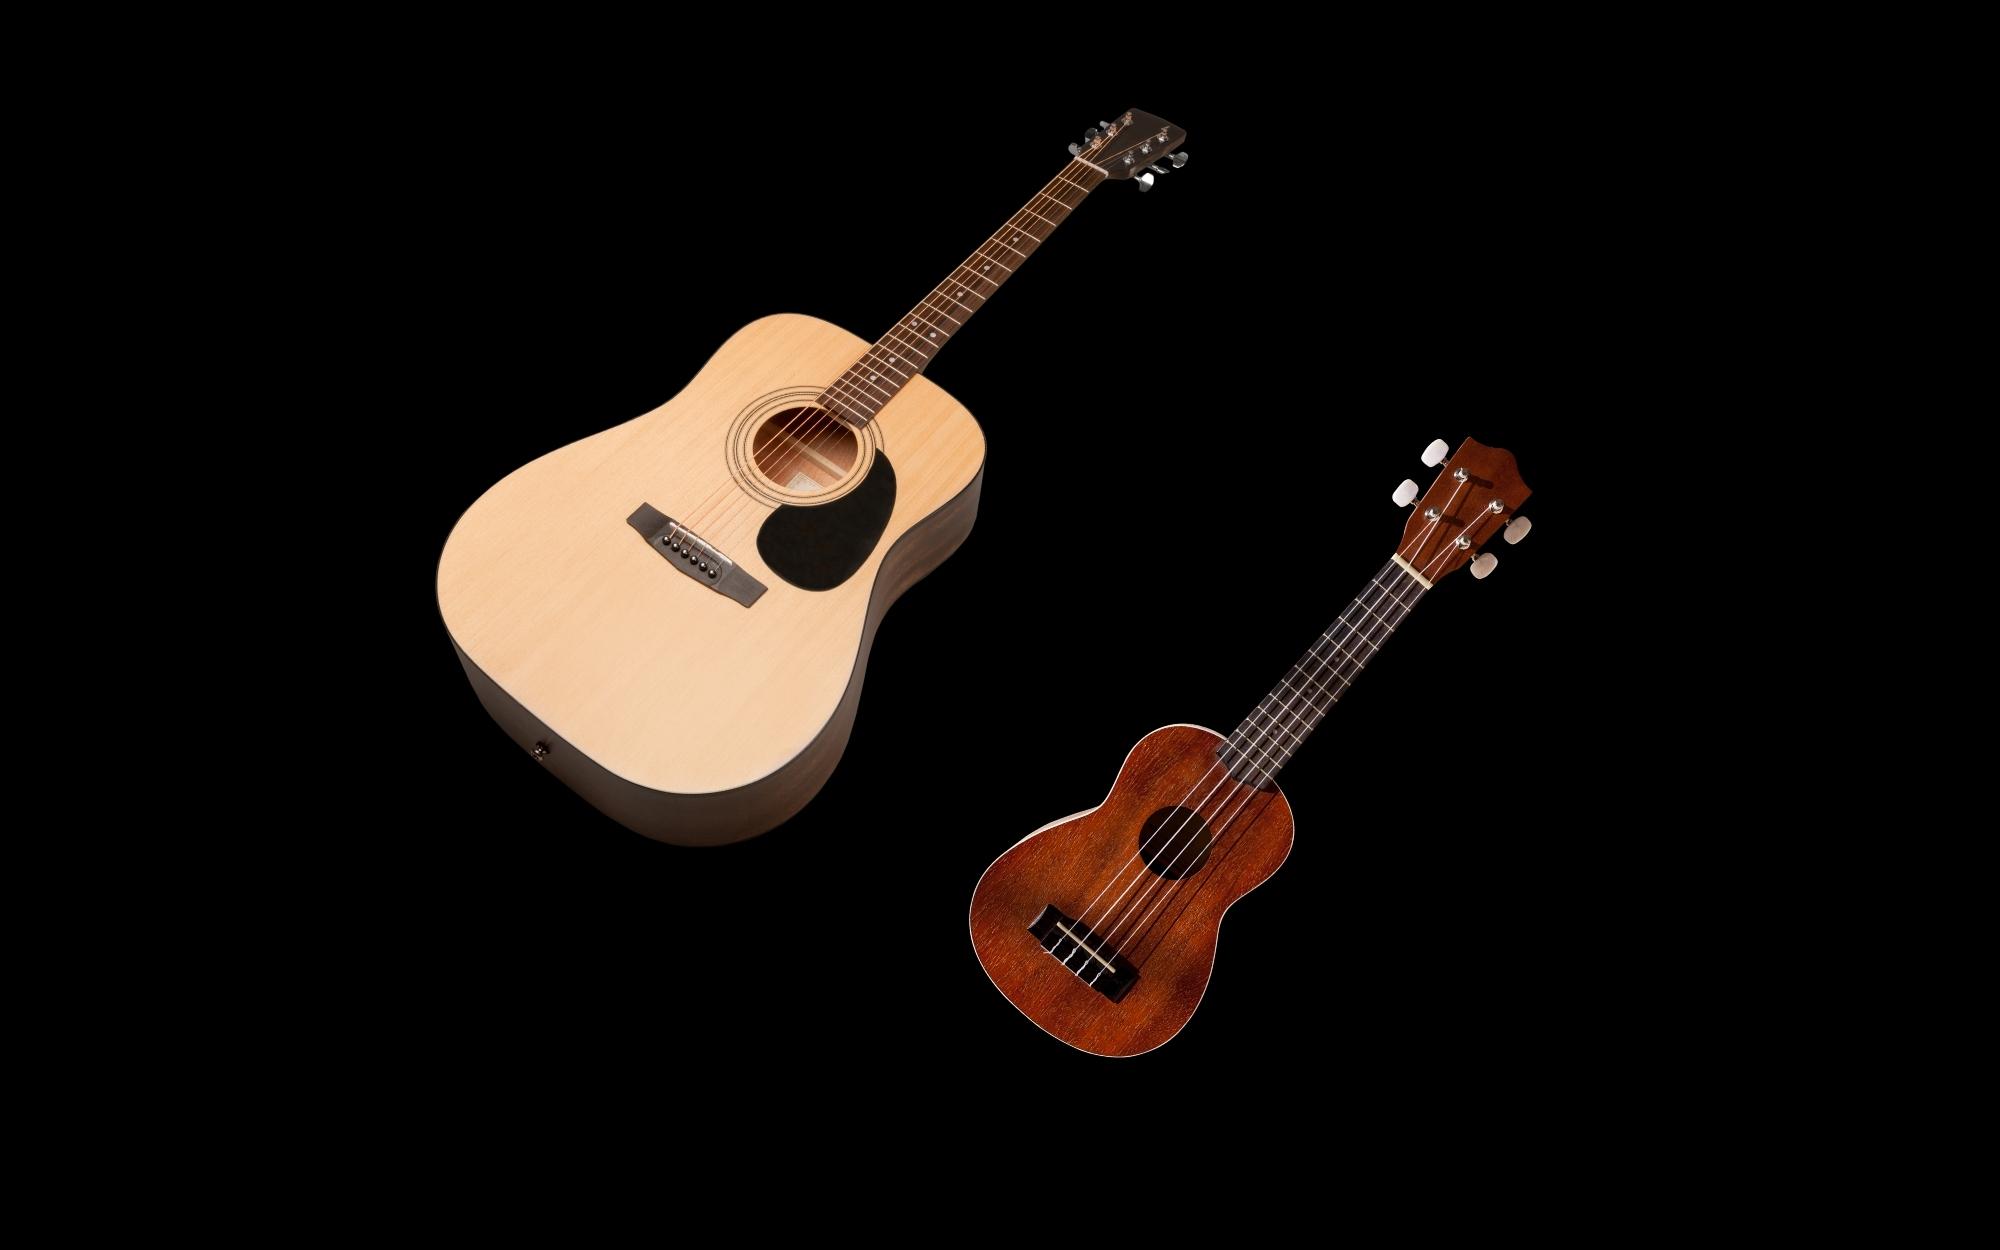 Gitarre/ Ukulele mieten